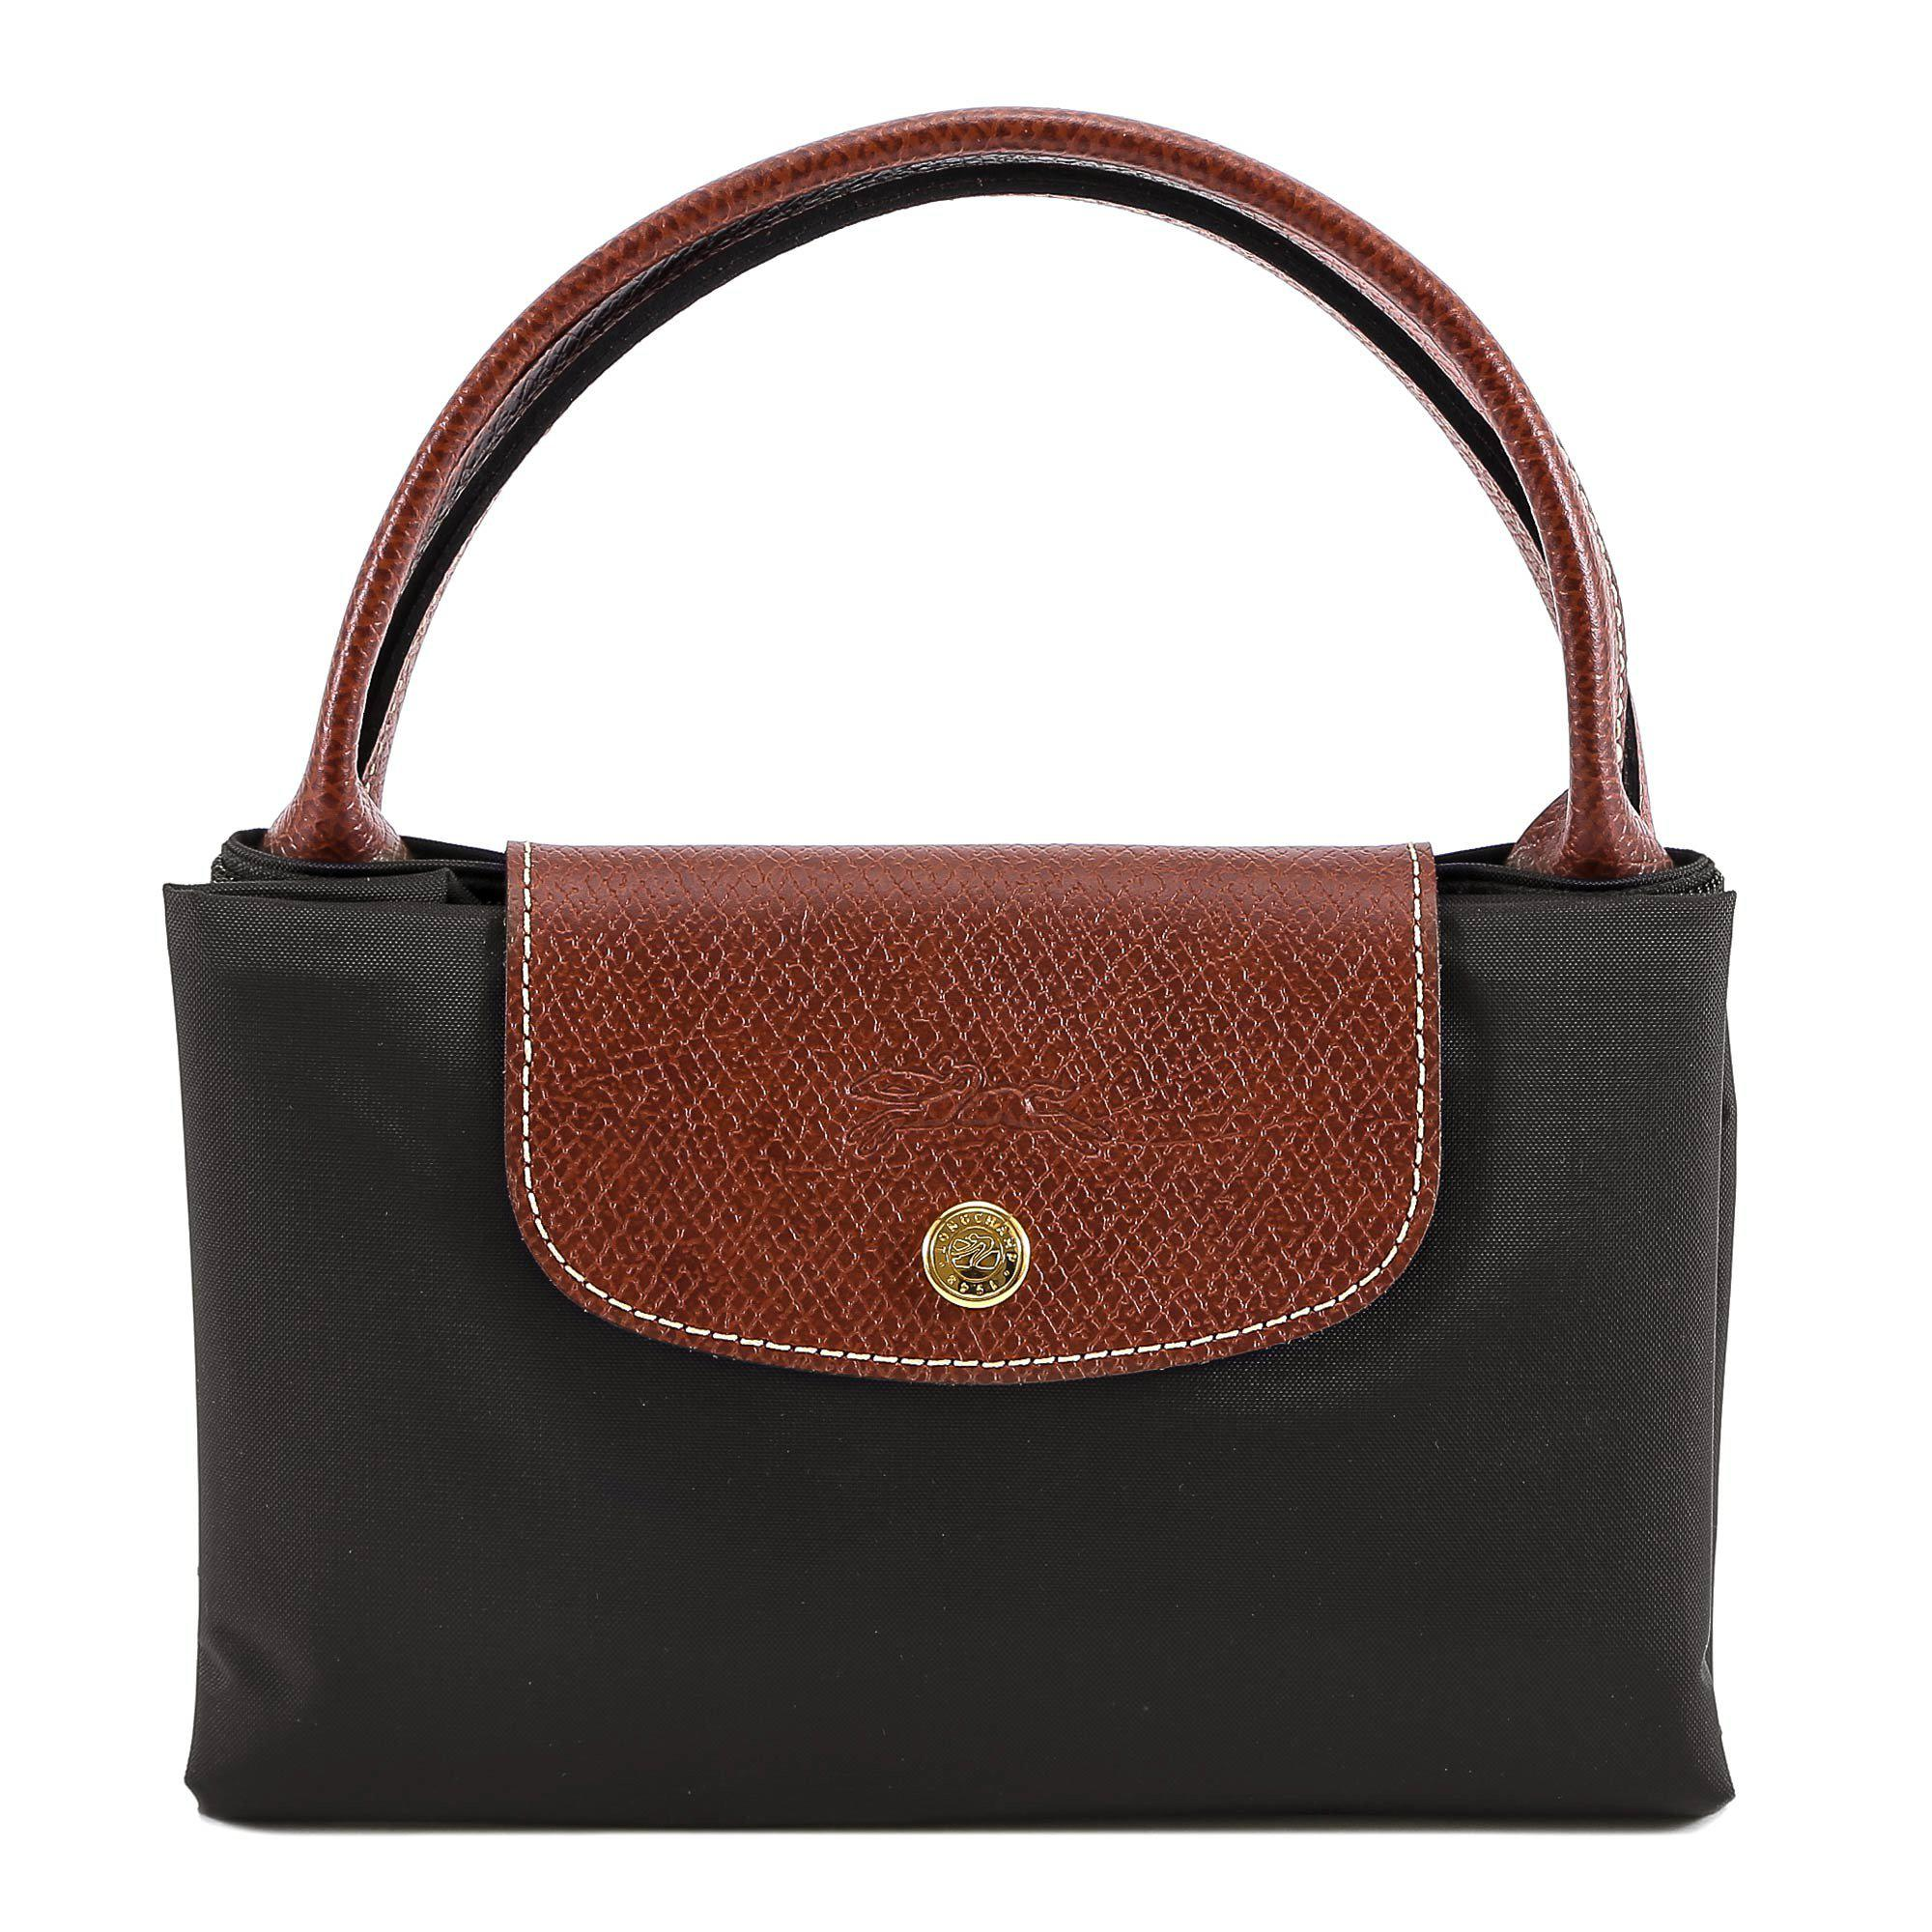 Longchamp Le Pliage M Top Handle Bag in Gray - Lyst 2823a4c66e6b0